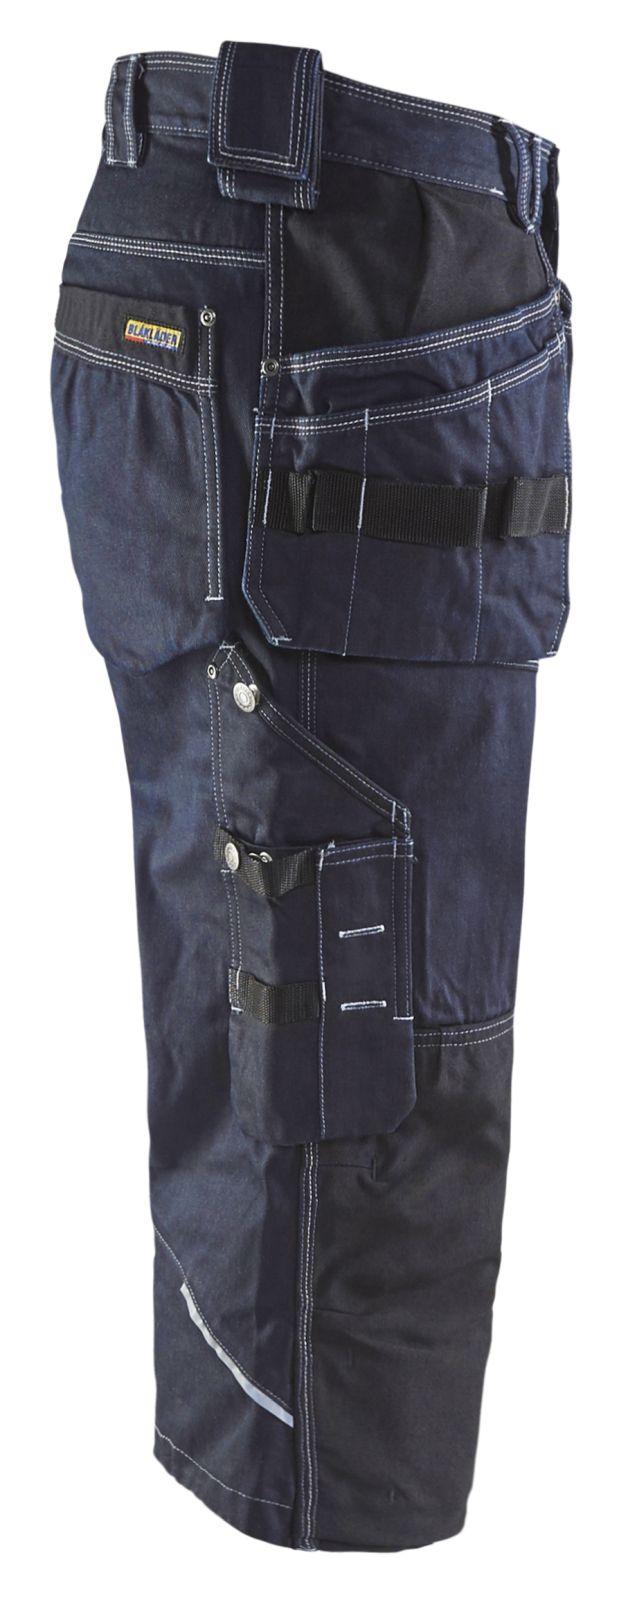 Blaklader Piraatbroeken 19621140 marineblauw-zwart(8999)